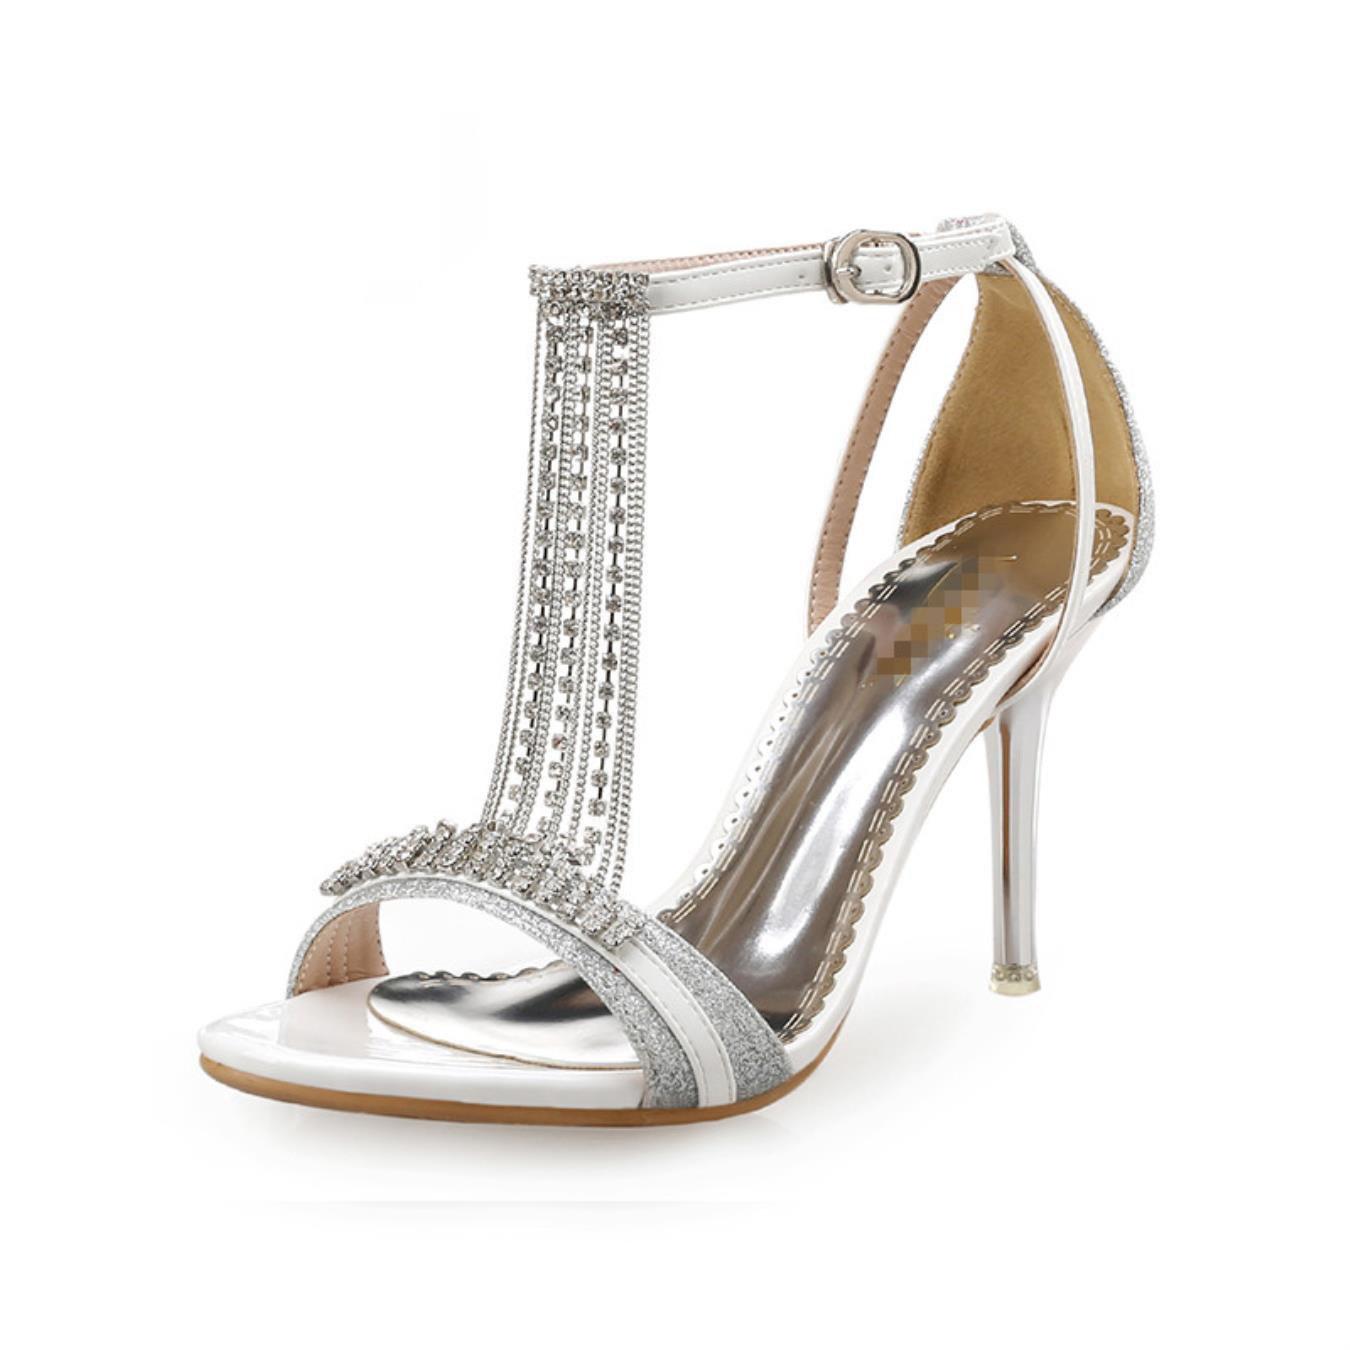 663daa5f0f741 Cristal dorado Boda de mujeres de verano sandalias de moda zapatos Novia  fiesta zapatos de vestir altos talones damas Sandalias Plata